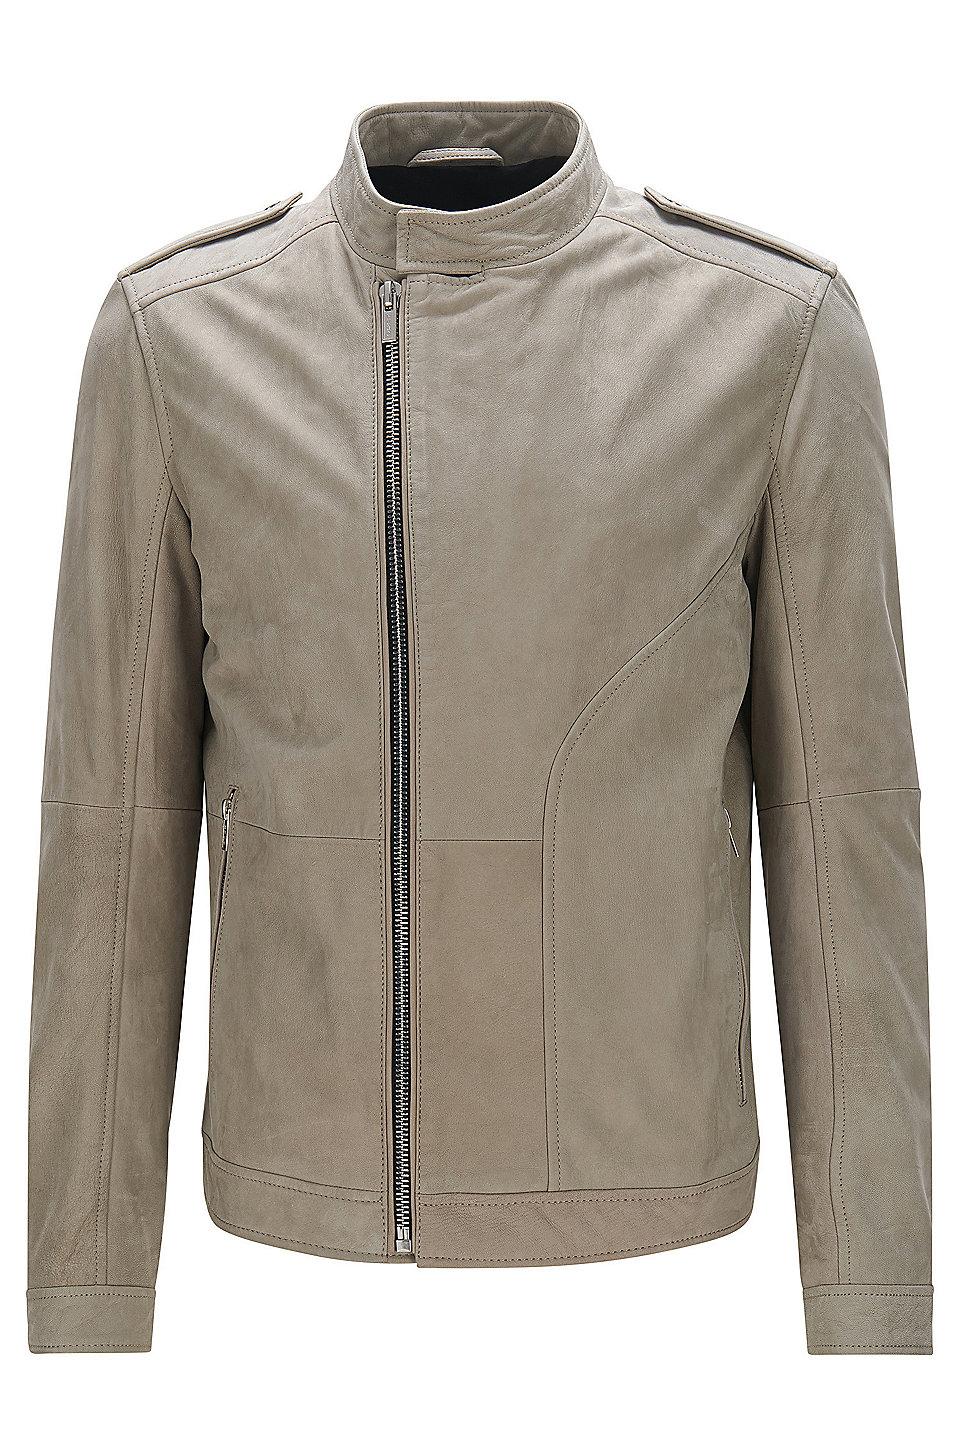 Hugo boss ladies leather gloves -  Landerson Regular Fit Asymmetrical Leather Jacket